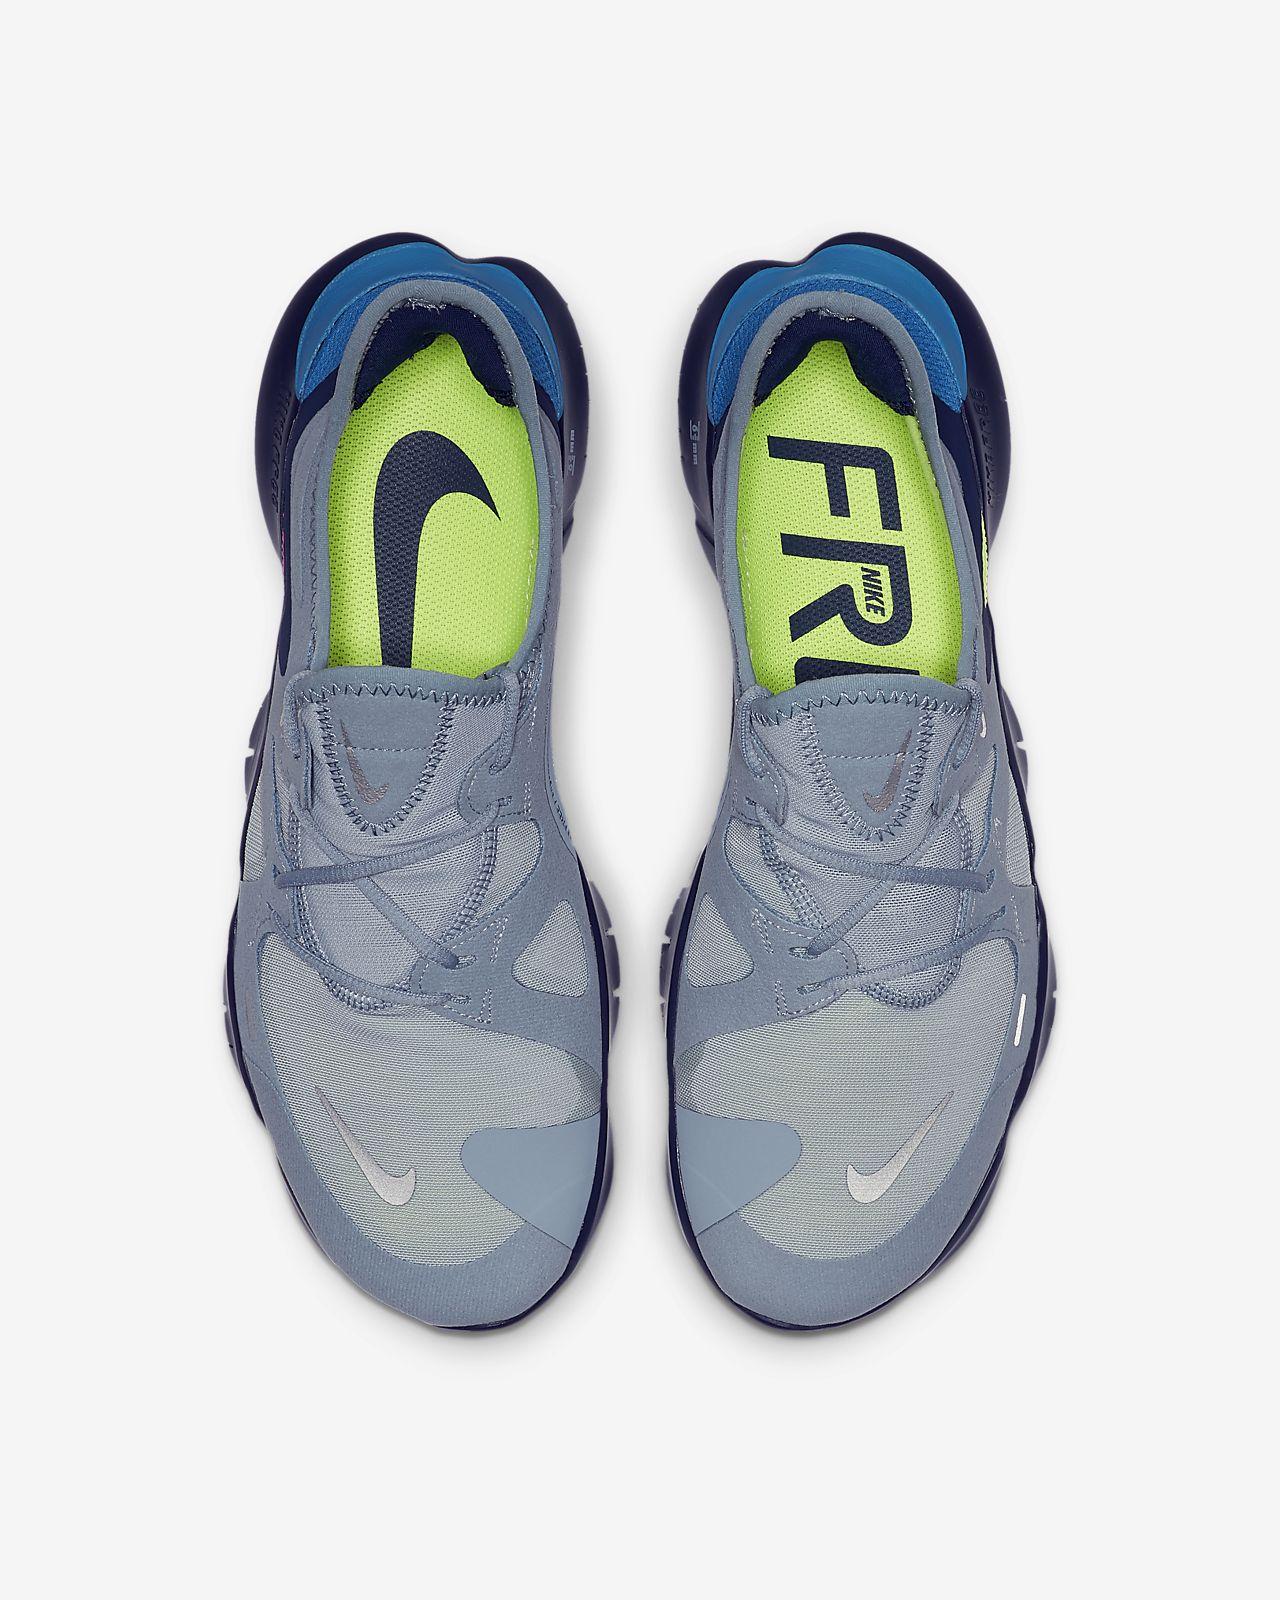 1bb7dc61349 Nike Free RN 5.0 Men s Running Shoe. Nike.com